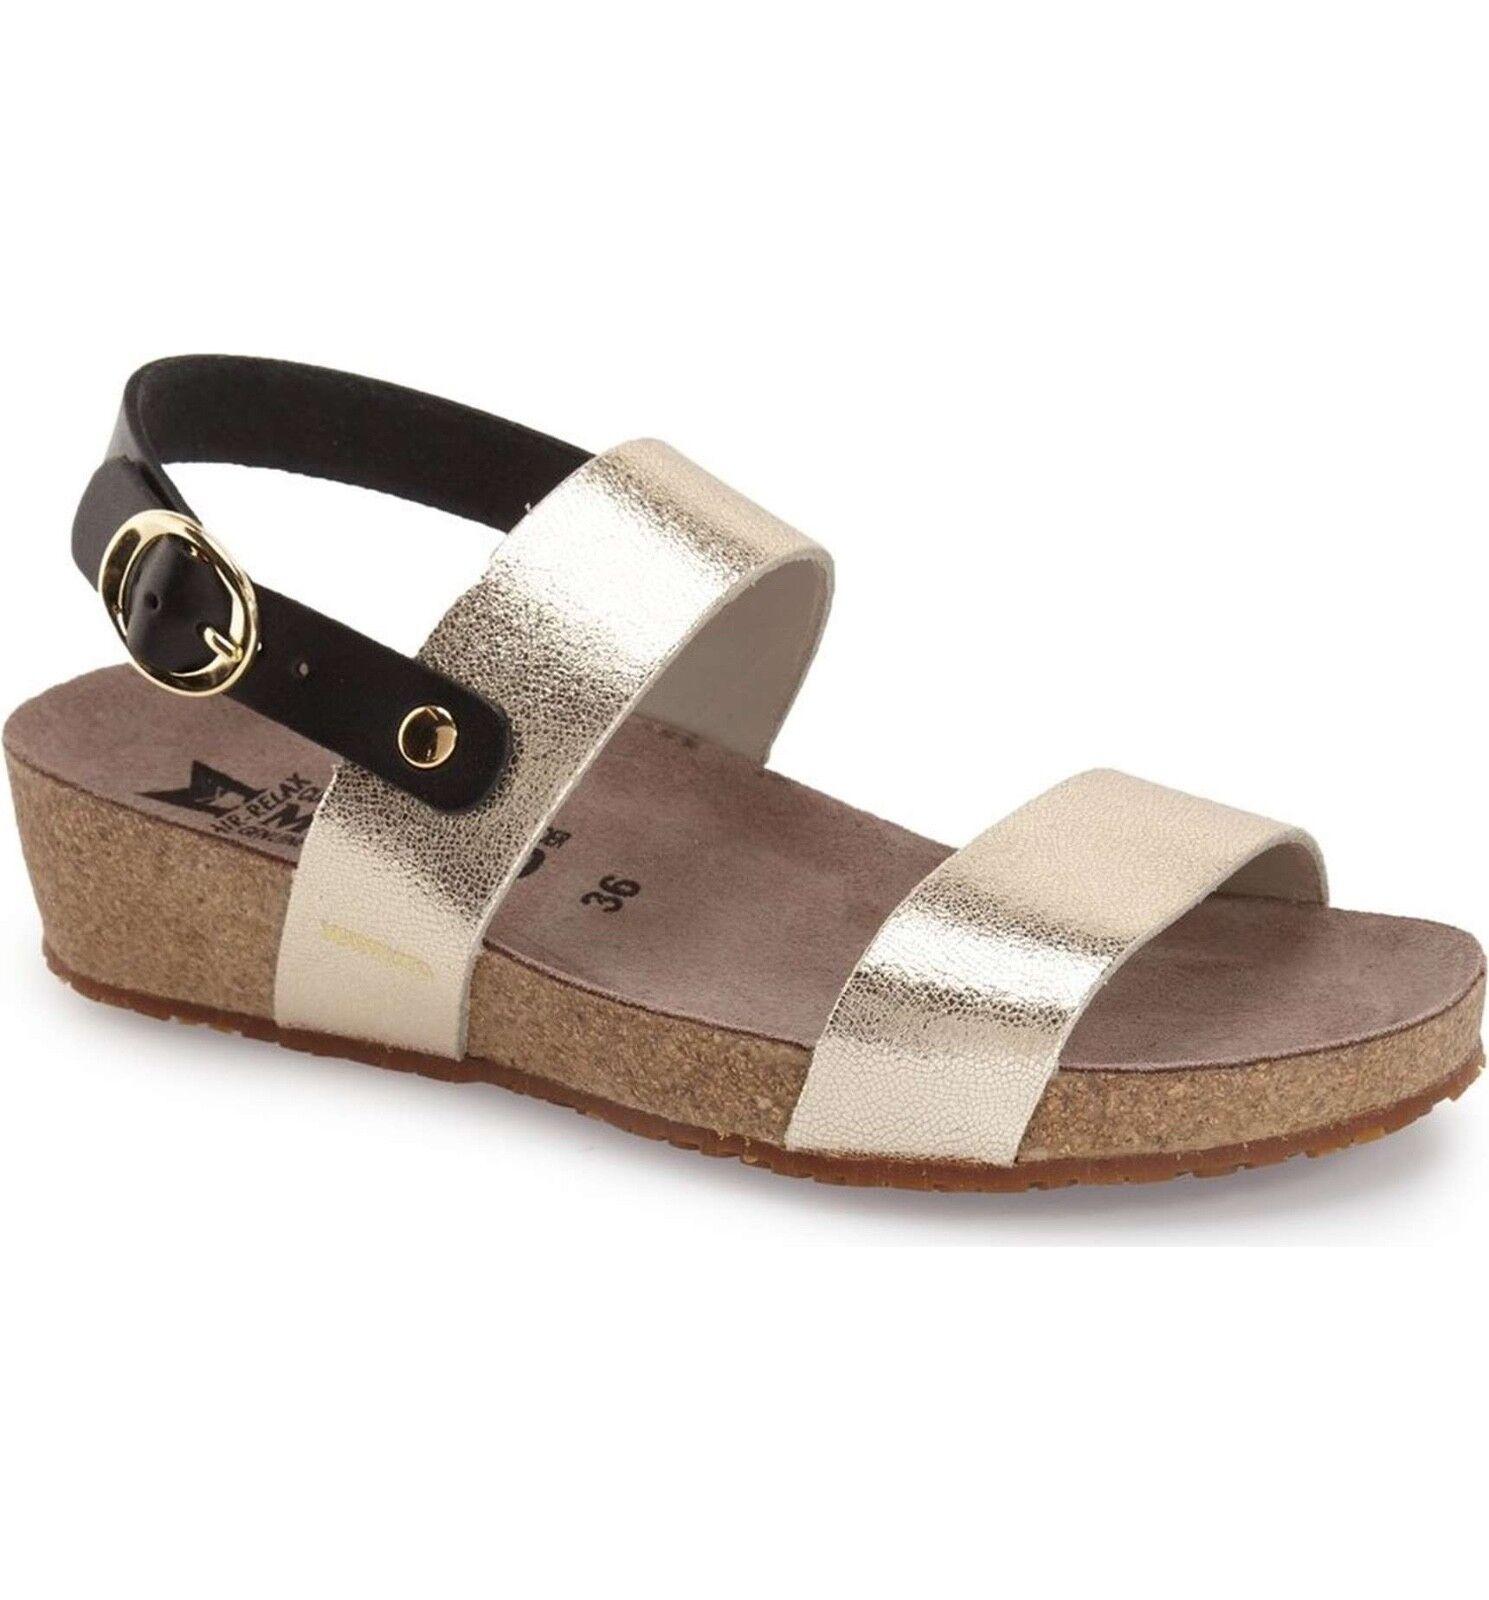 MEPHISTO 'Italia' Sandale 37 in Platinum Leder EU 37 Sandale US 6.5-7 d94340